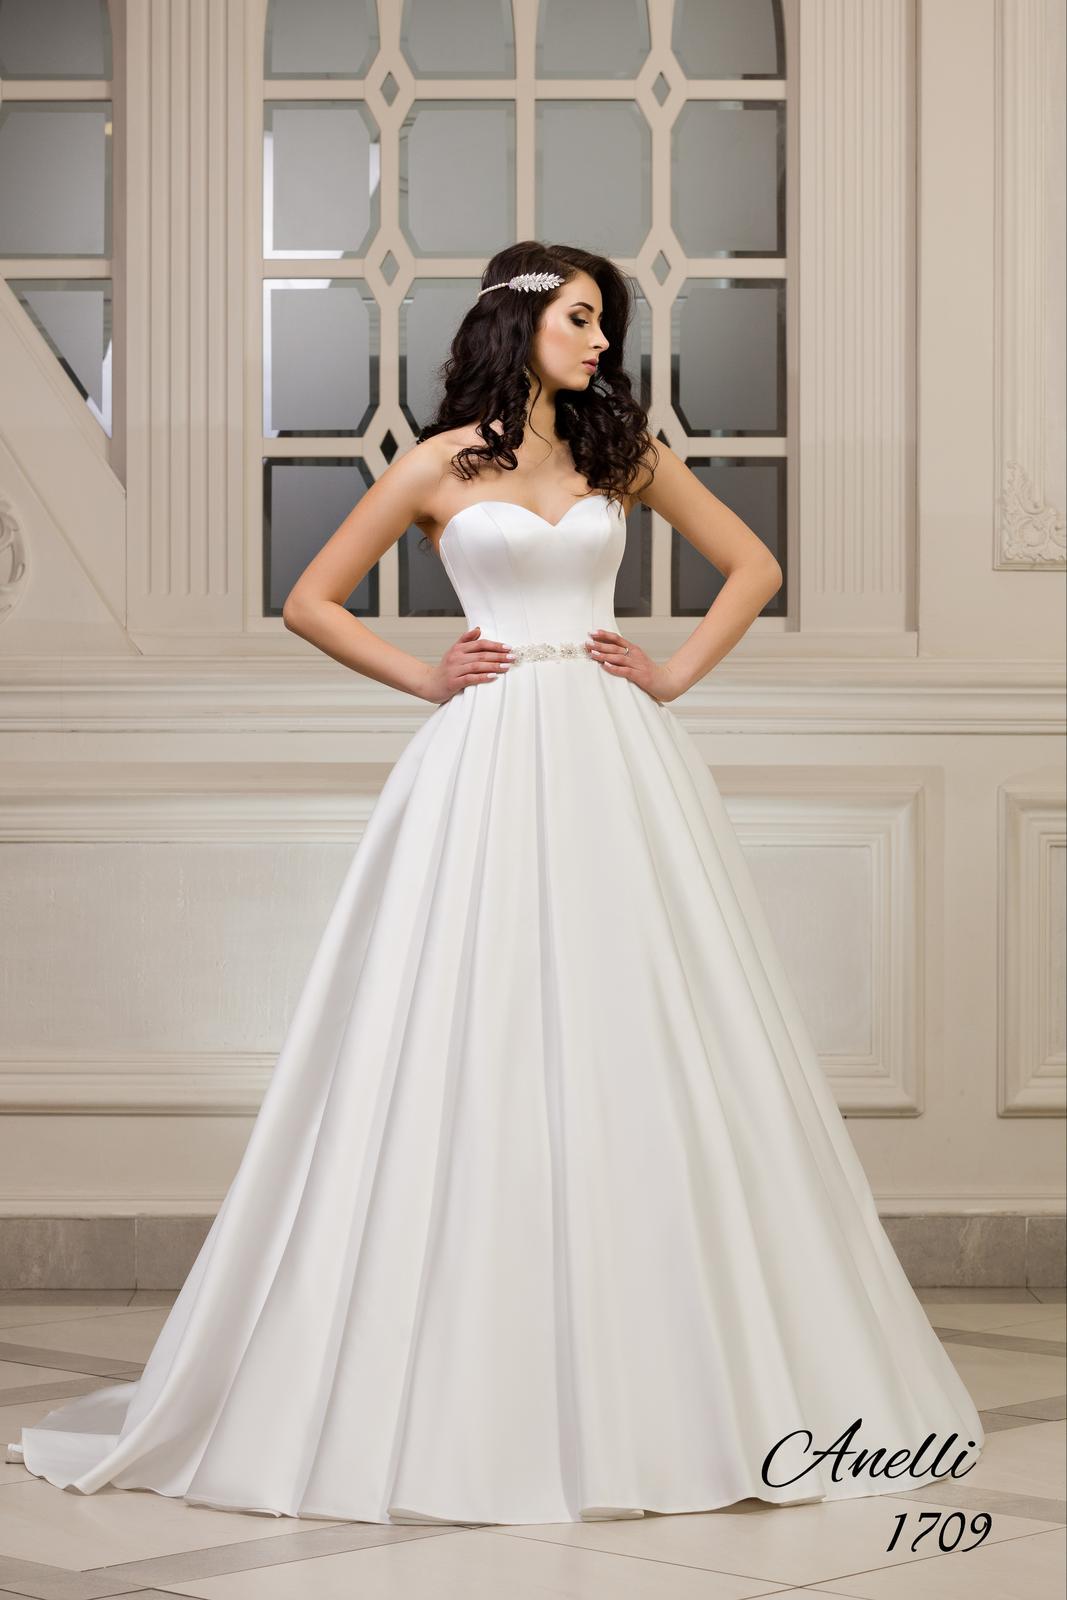 Svadobné šaty - Debut 1709 - Obrázok č. 1